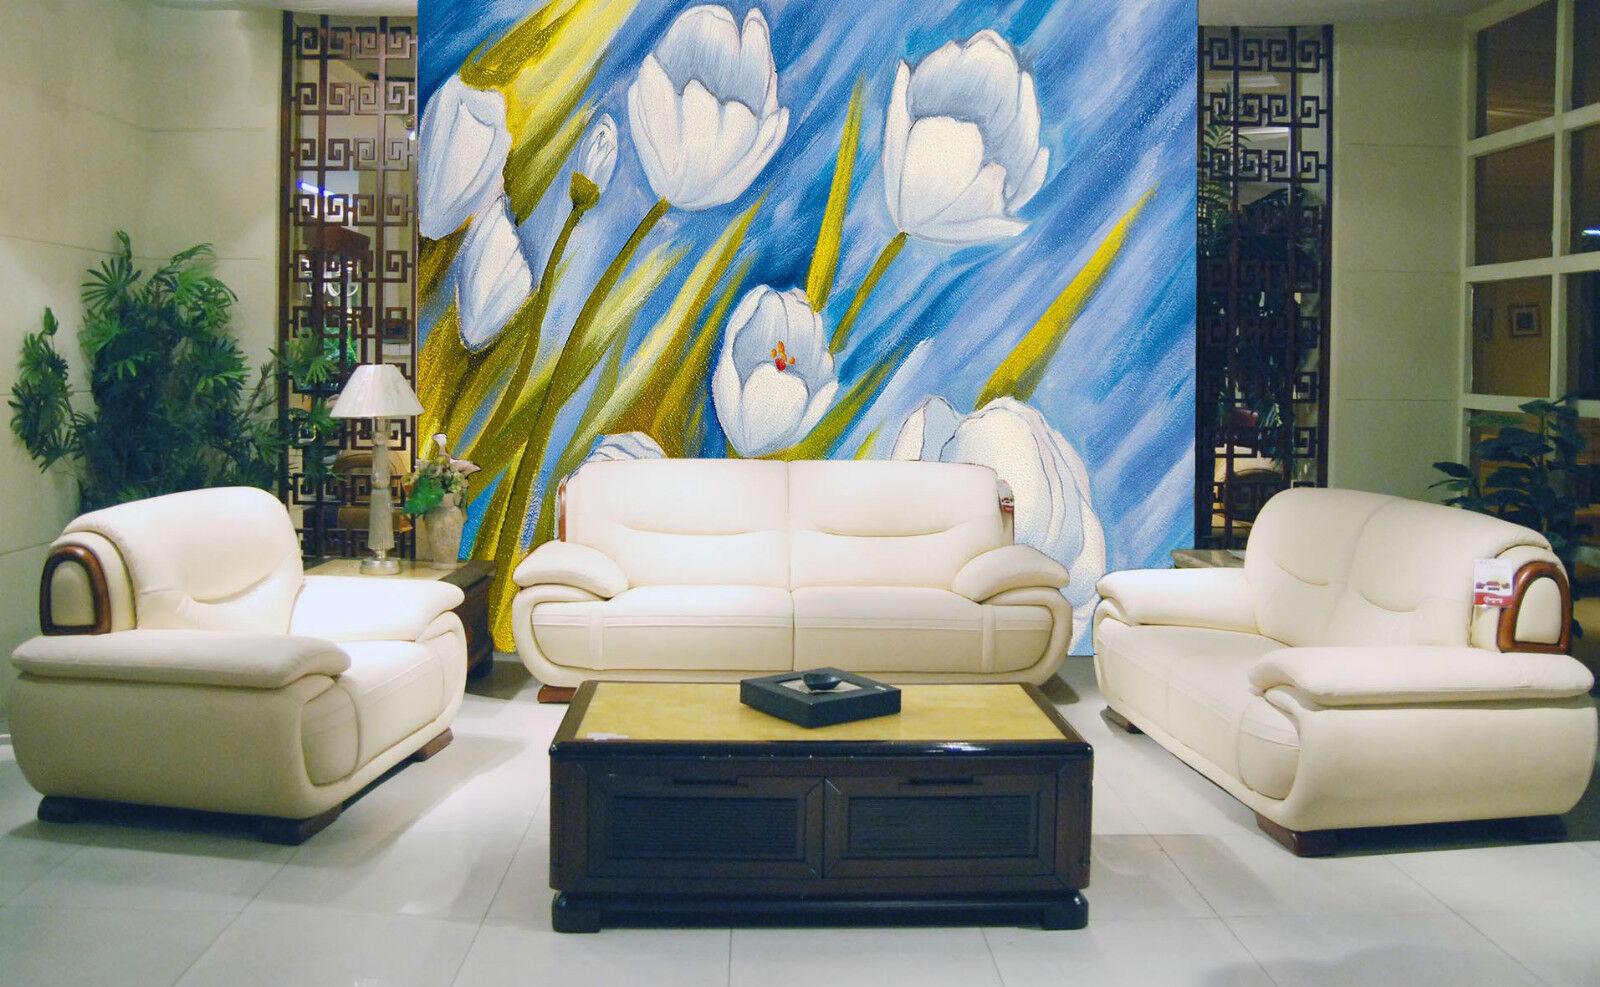 3D Gemälde im weißen tulpen 3 Fototapeten Wandbild Fototapete BildTapete Familie